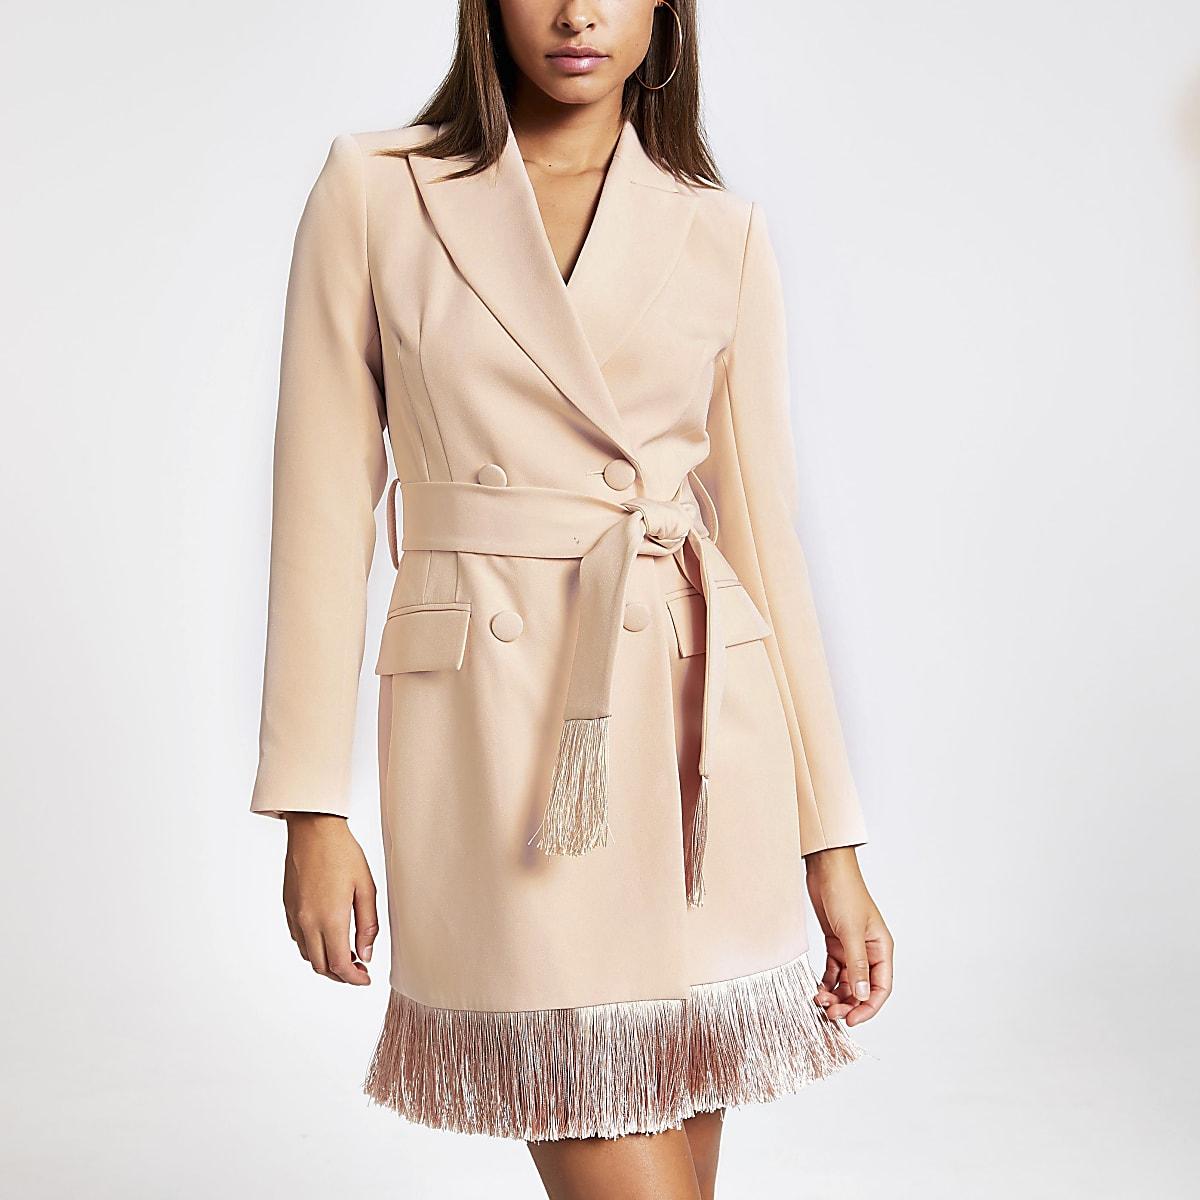 Pink tassel fringe blazer dress